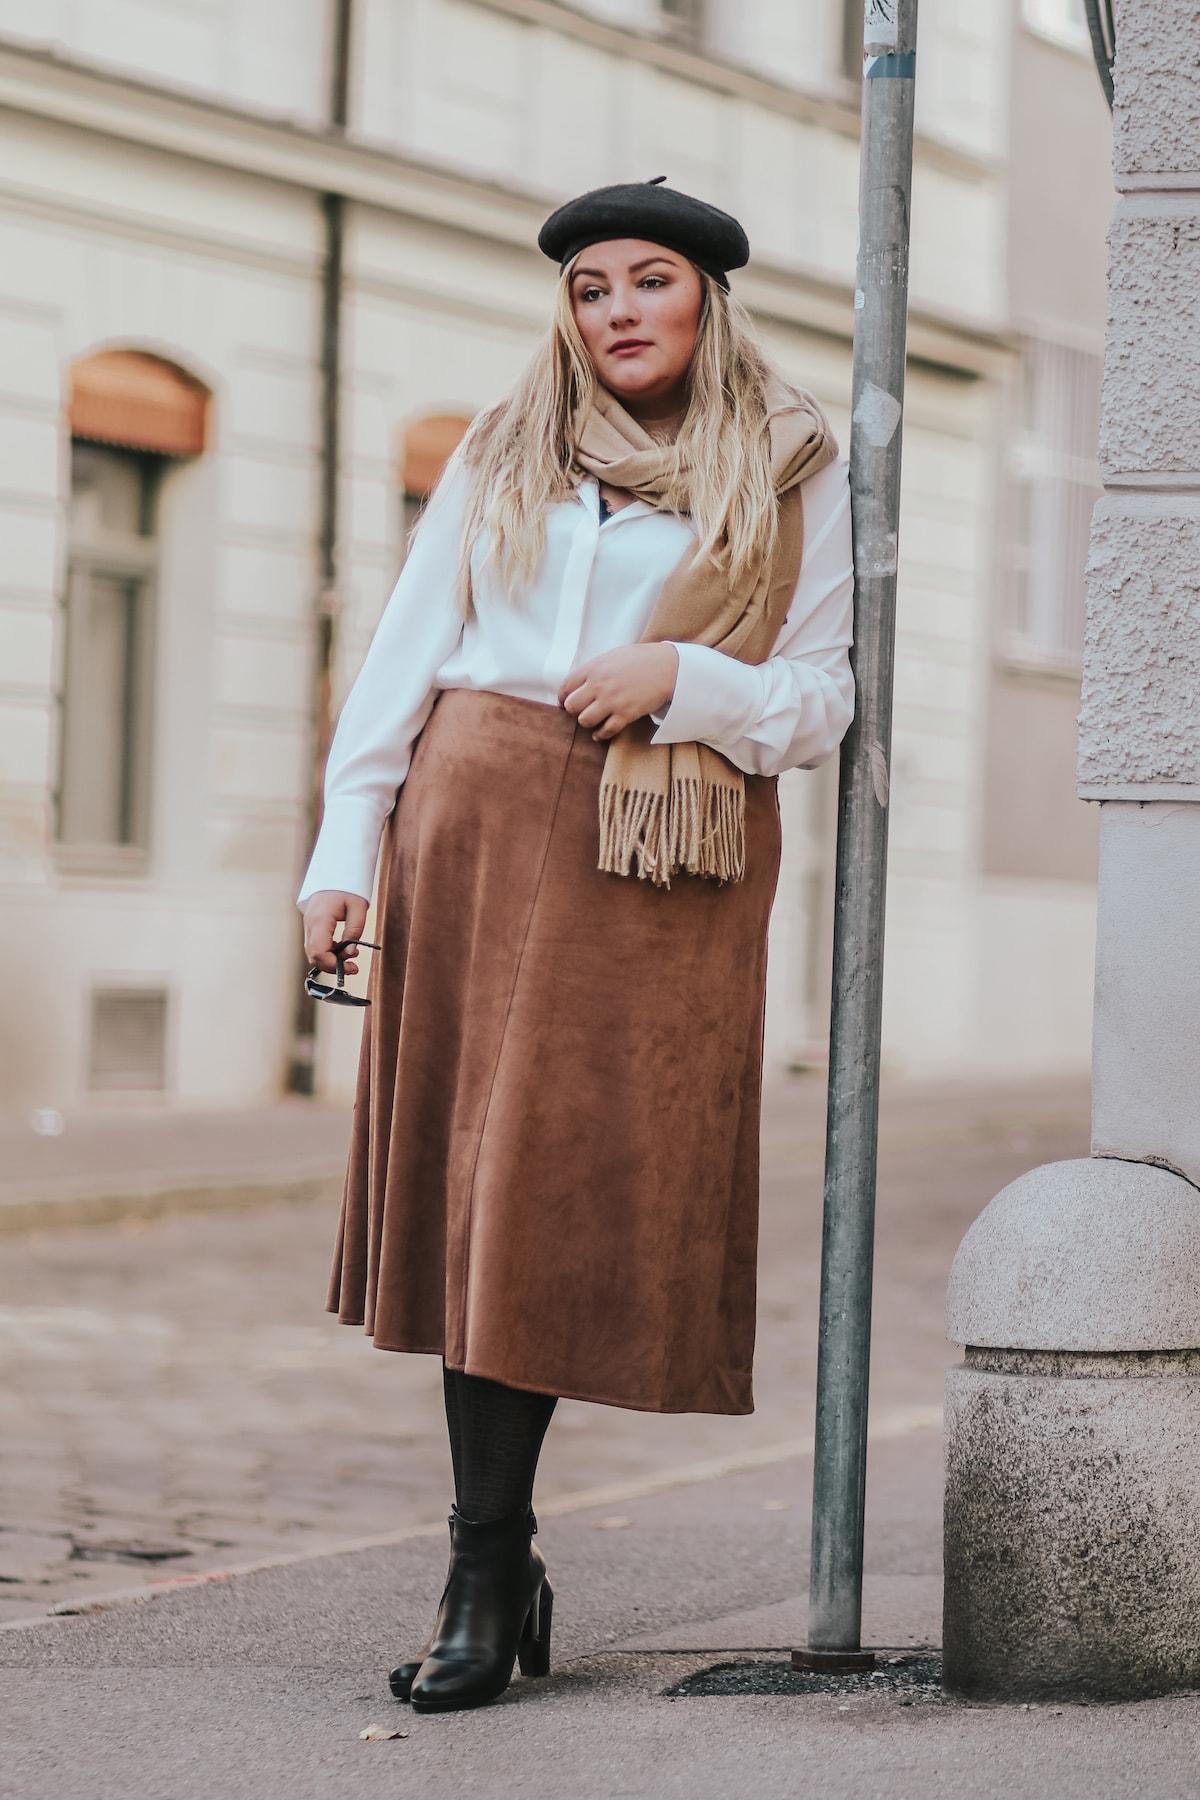 Plus Size Outfit – Pariser Herbst X Navabi (Werbung)